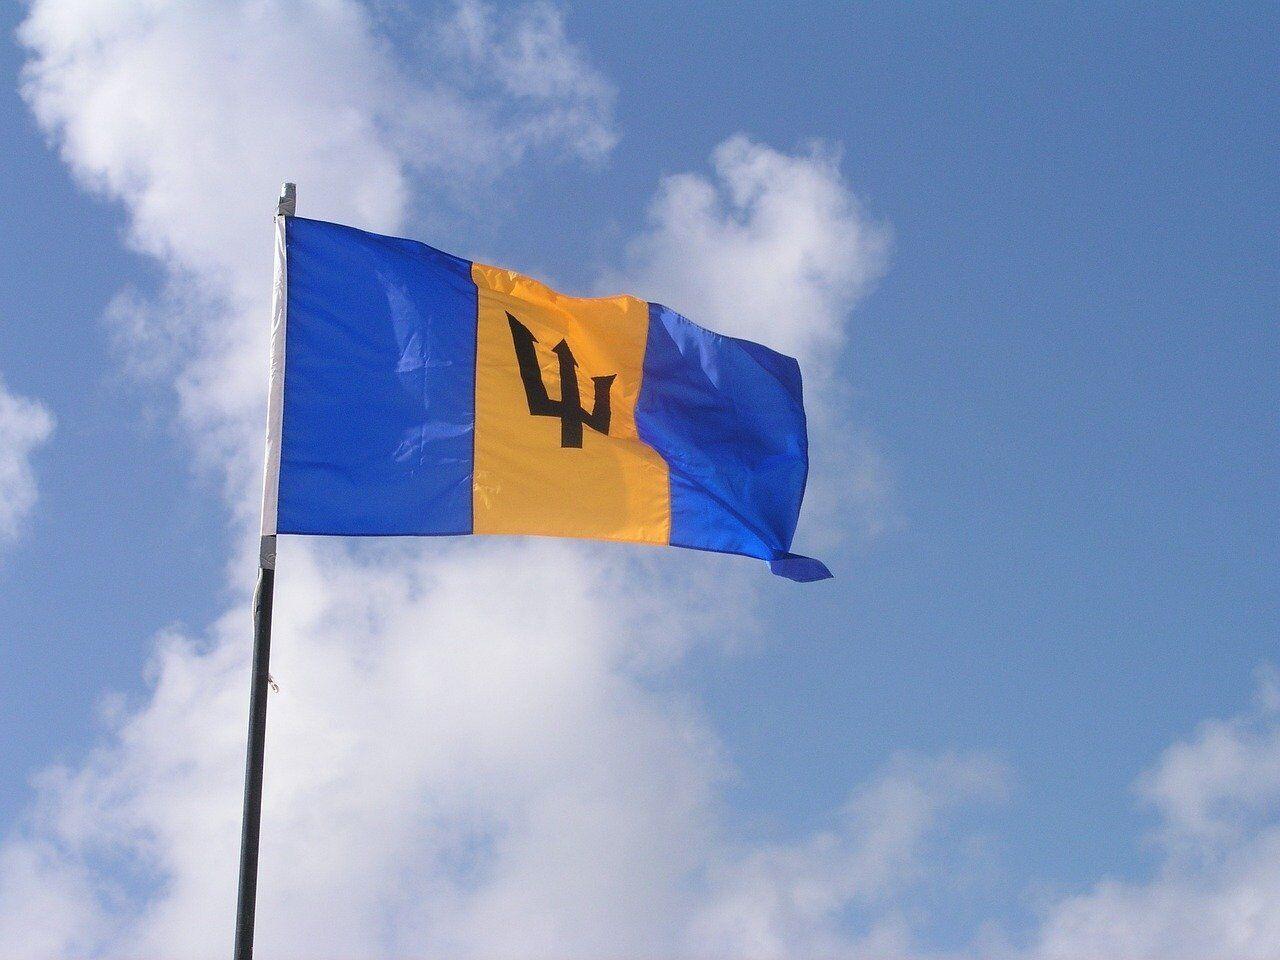 Тризуб нанесено на прапор Барбадосу